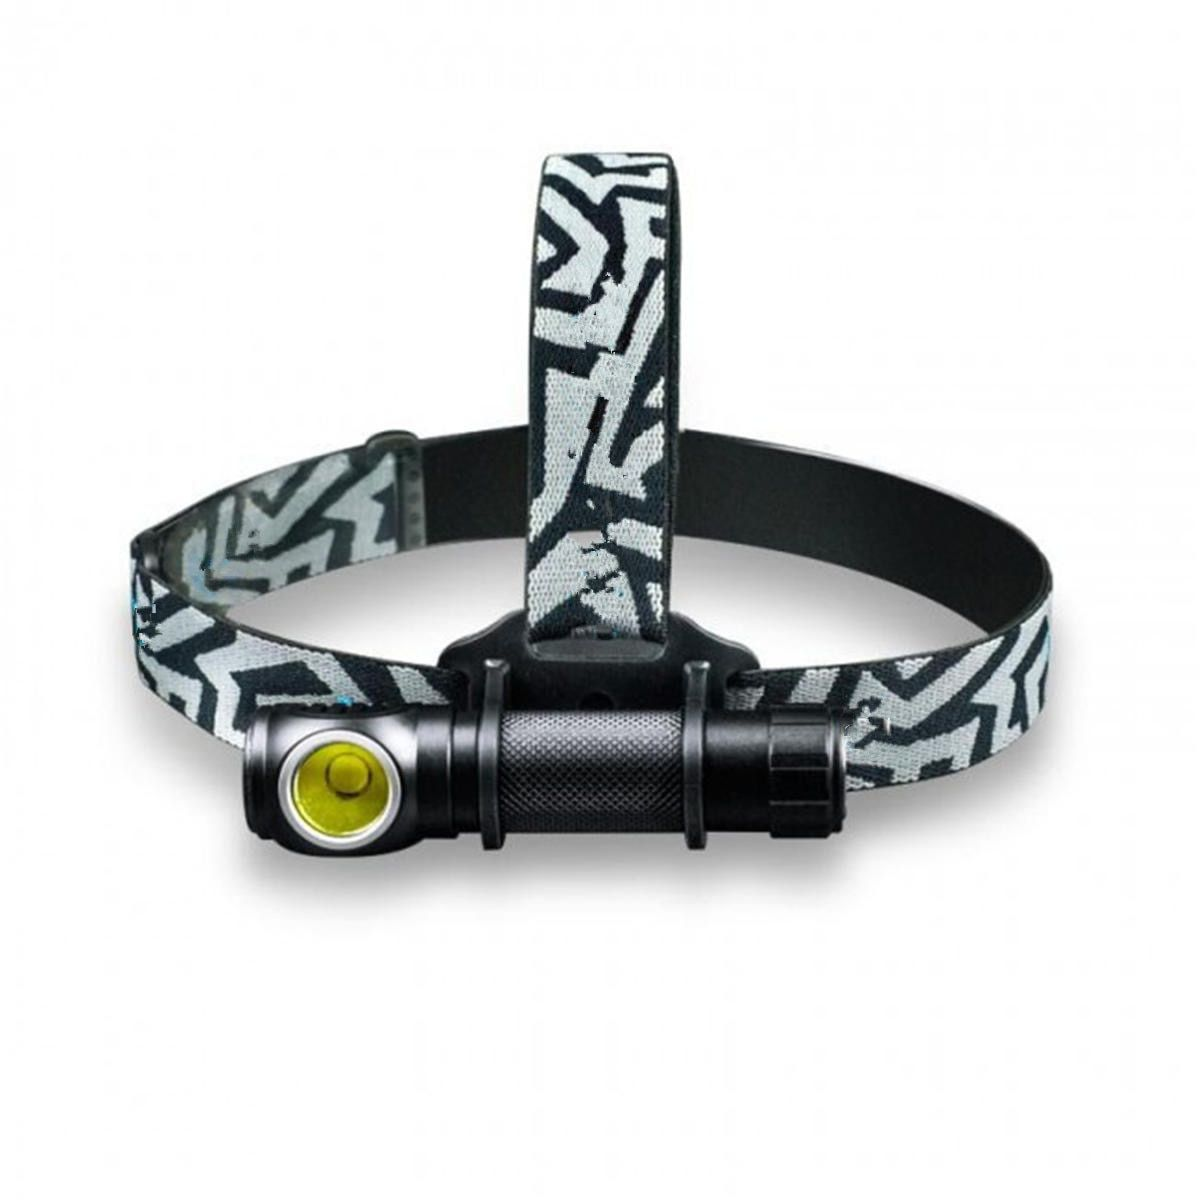 HR70 XHP70.2 3000LM Brightness Magnetic USB Charge Handheld Flashlight Hiking Light Charge LED Flashlight 2018 NEW